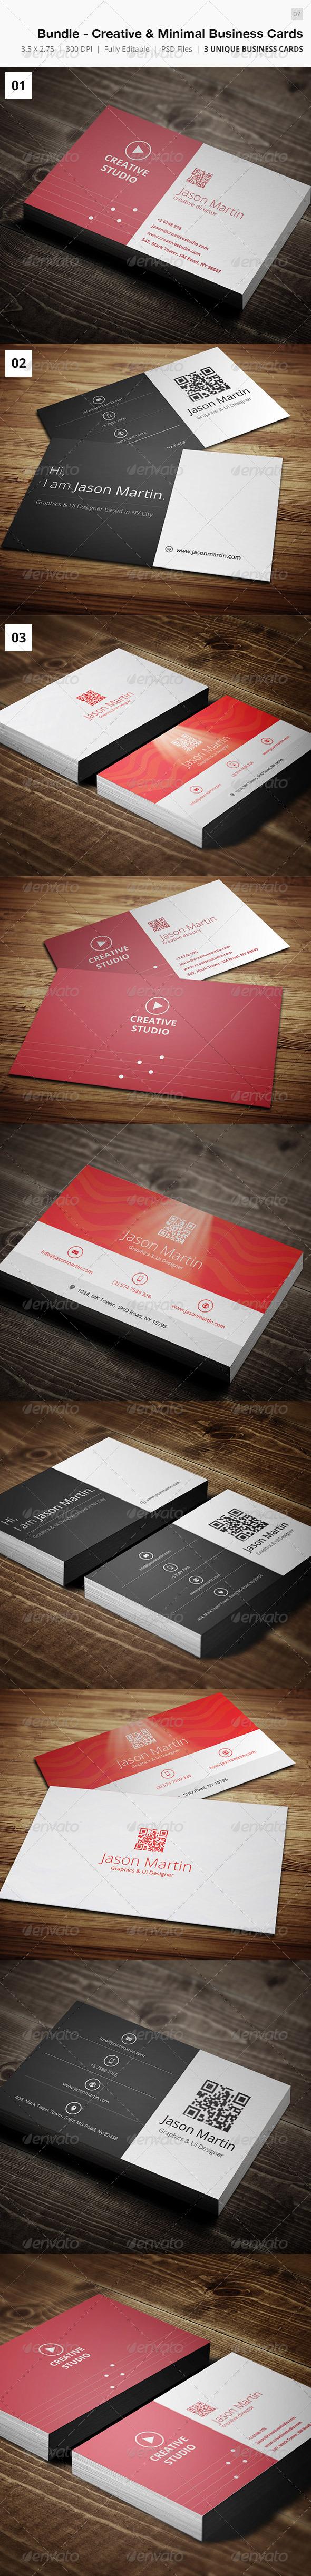 Bundle - Creative & Minimal Business Card - 07 - Creative Business Cards